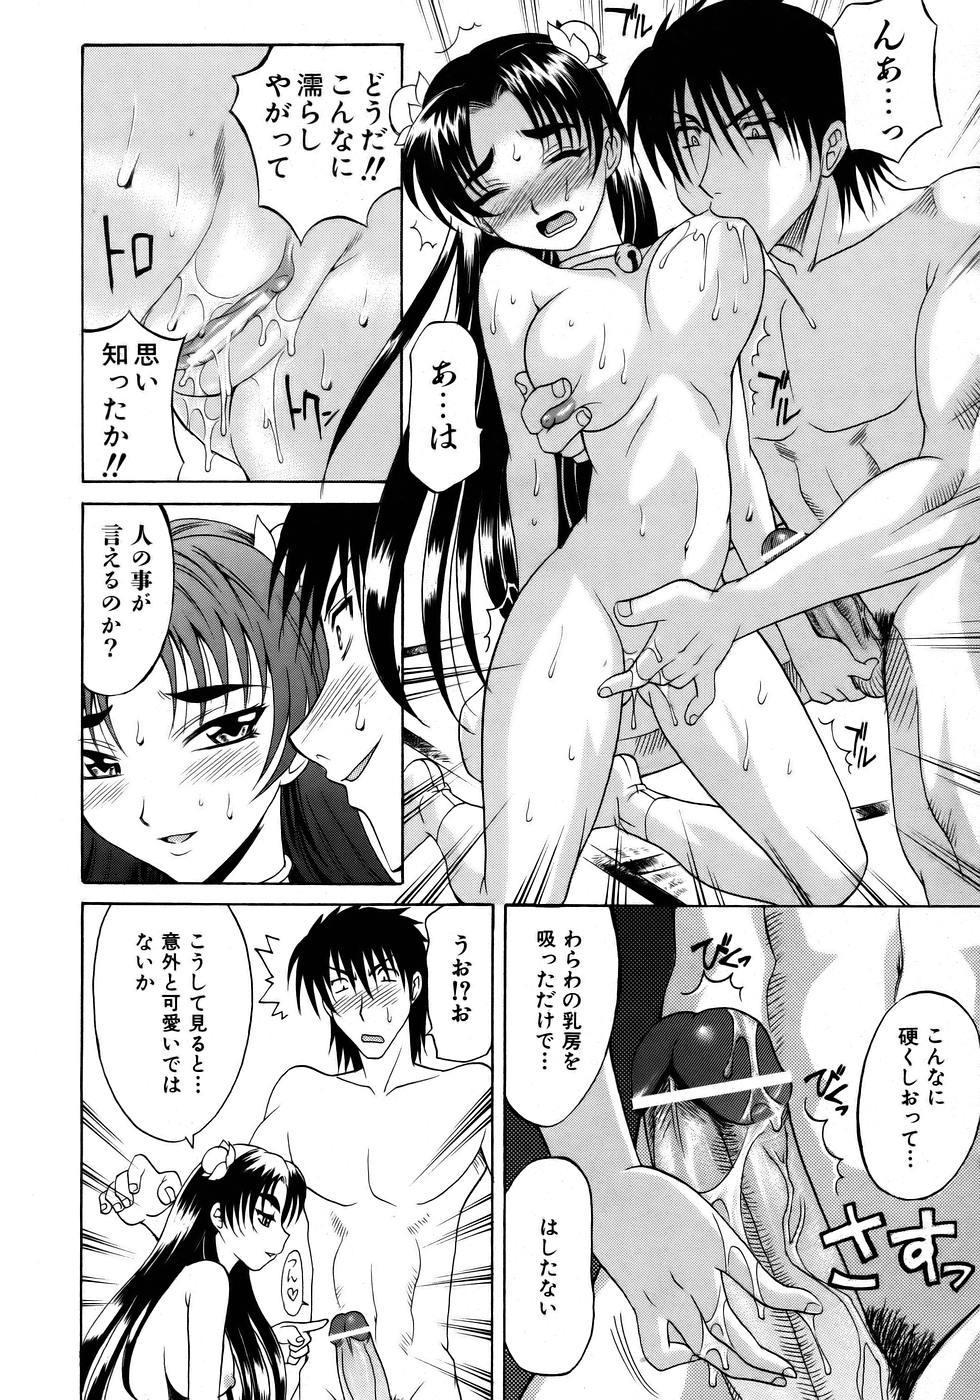 COMIC AUN 2005-12 Vol. 115 19